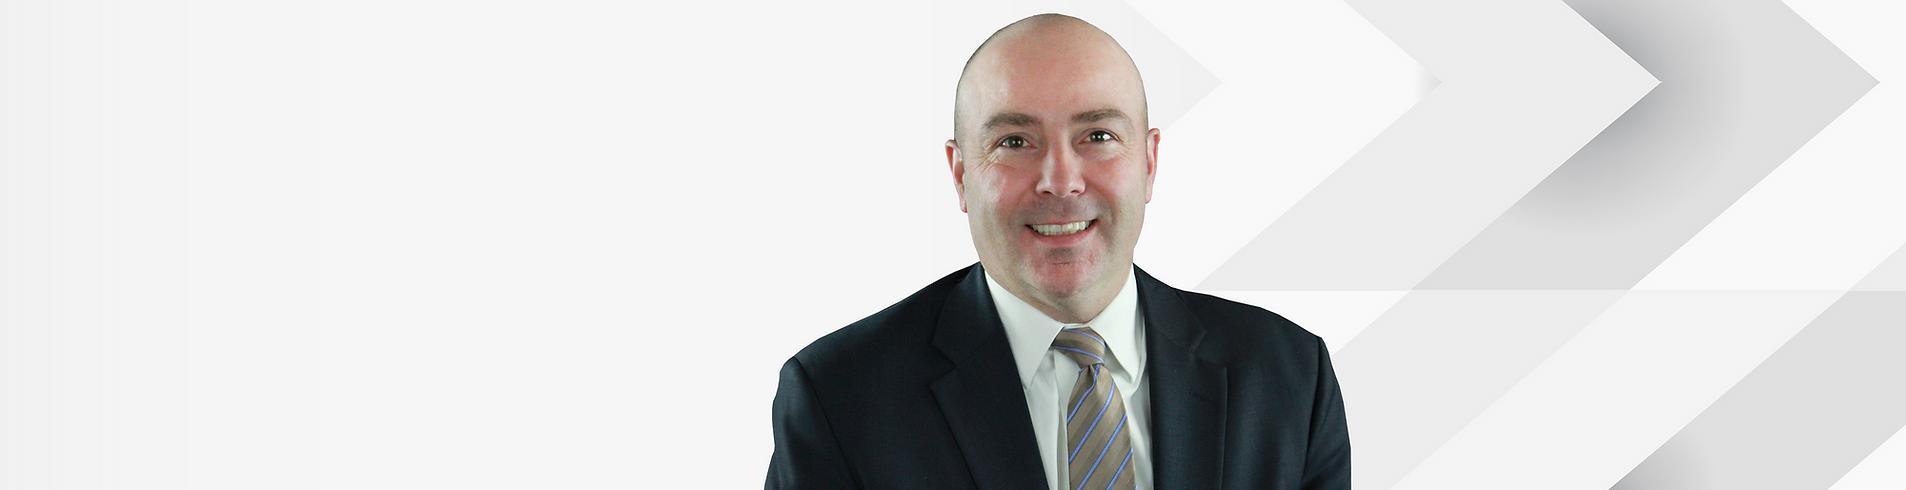 Christian Valentino, personal litigation attorney in Rochester NY